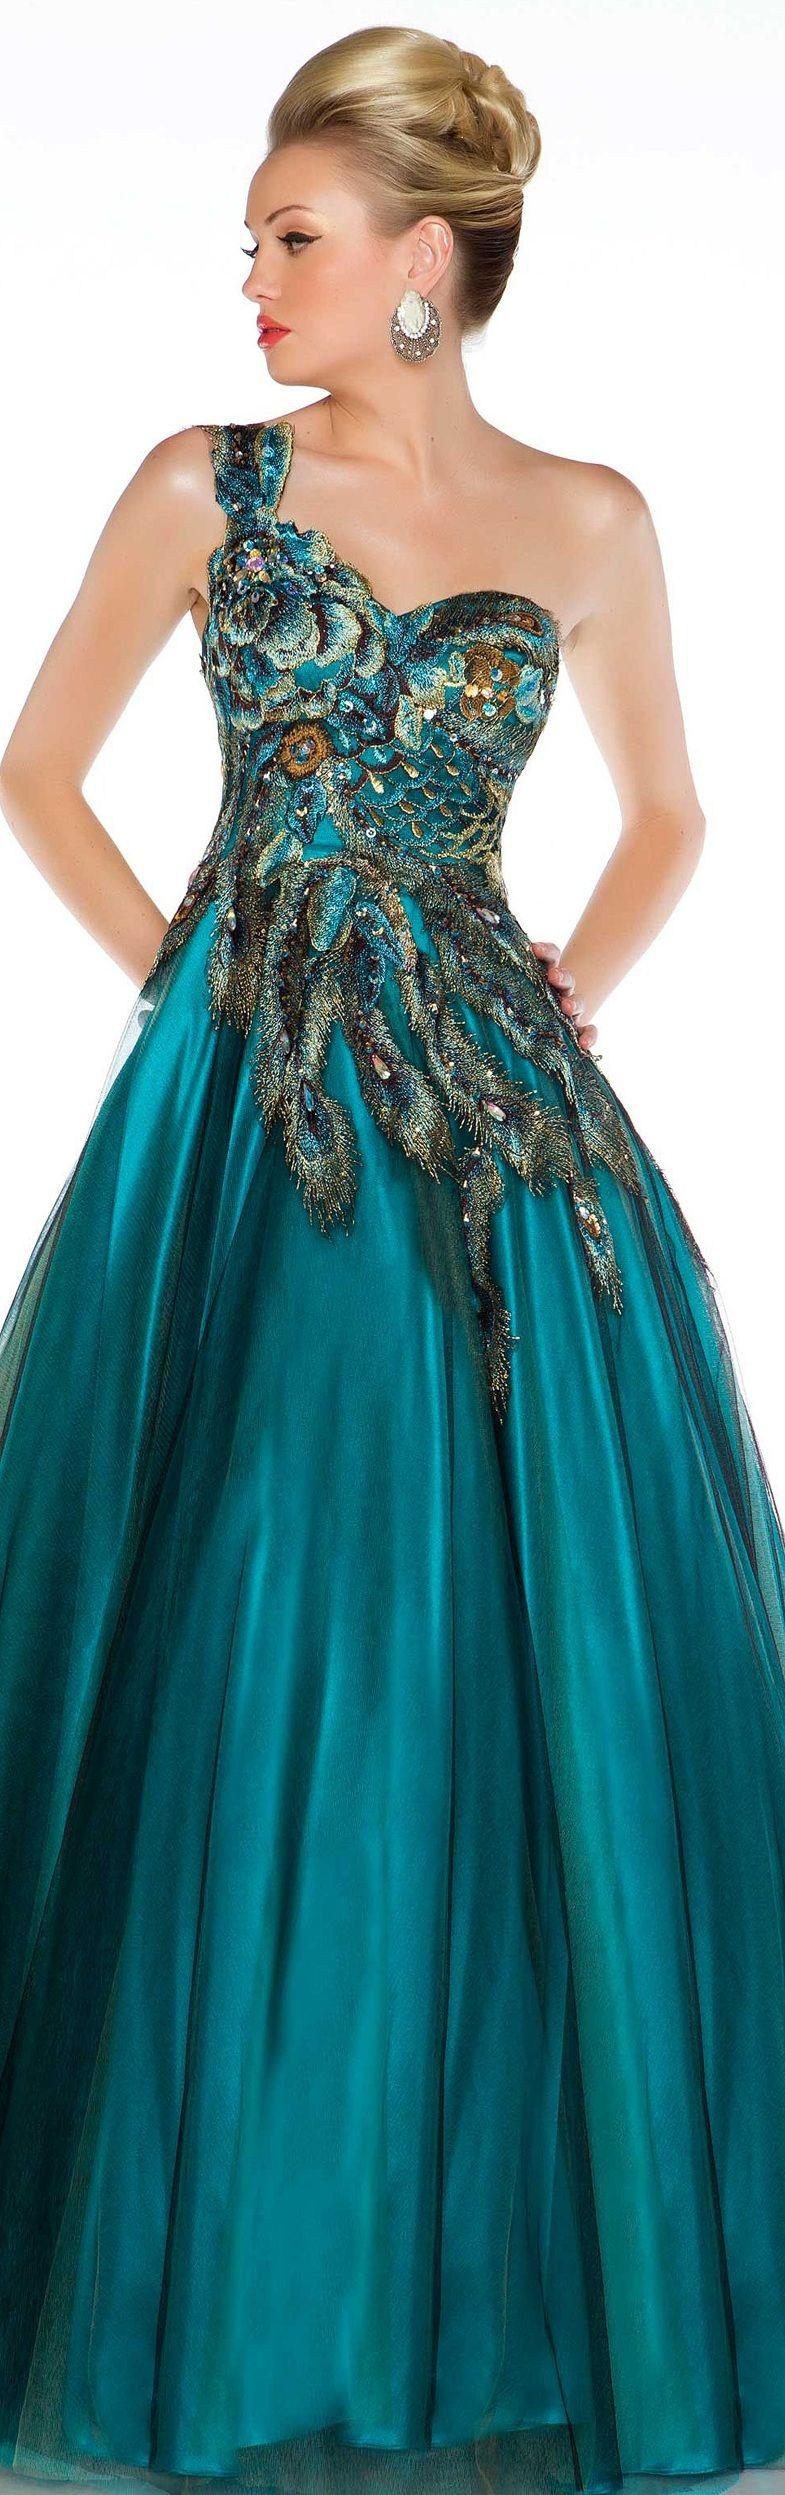 MacDuggal Couture (2013)  9501df47ce